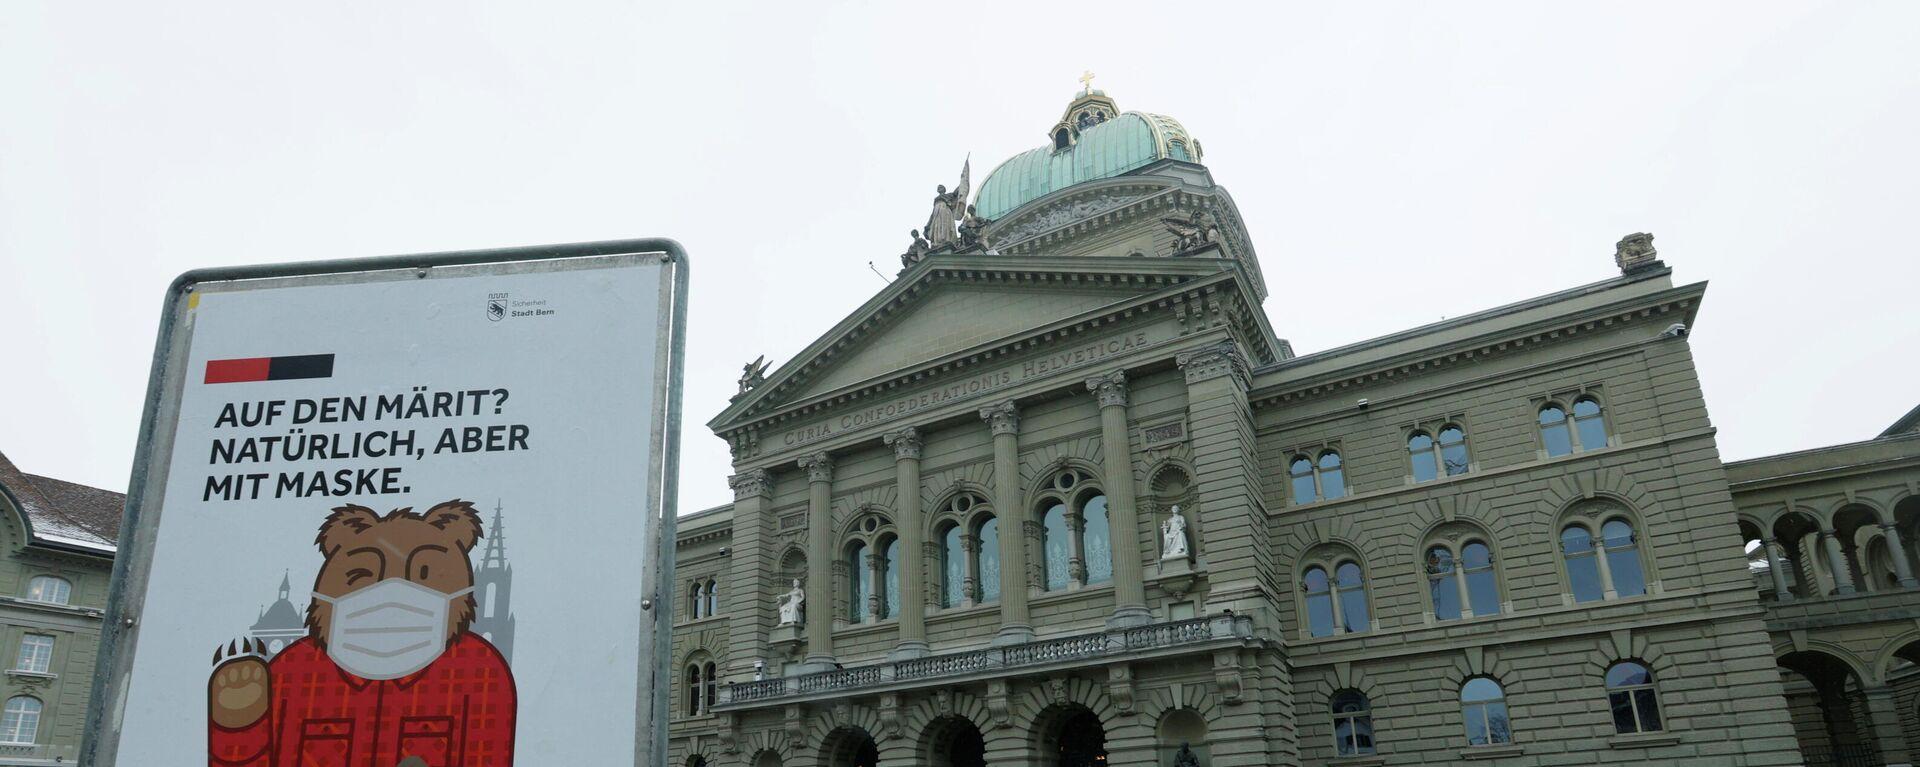 Bundeshaus in Bern am 6. Januar 2021 - SNA, 1920, 18.01.2021